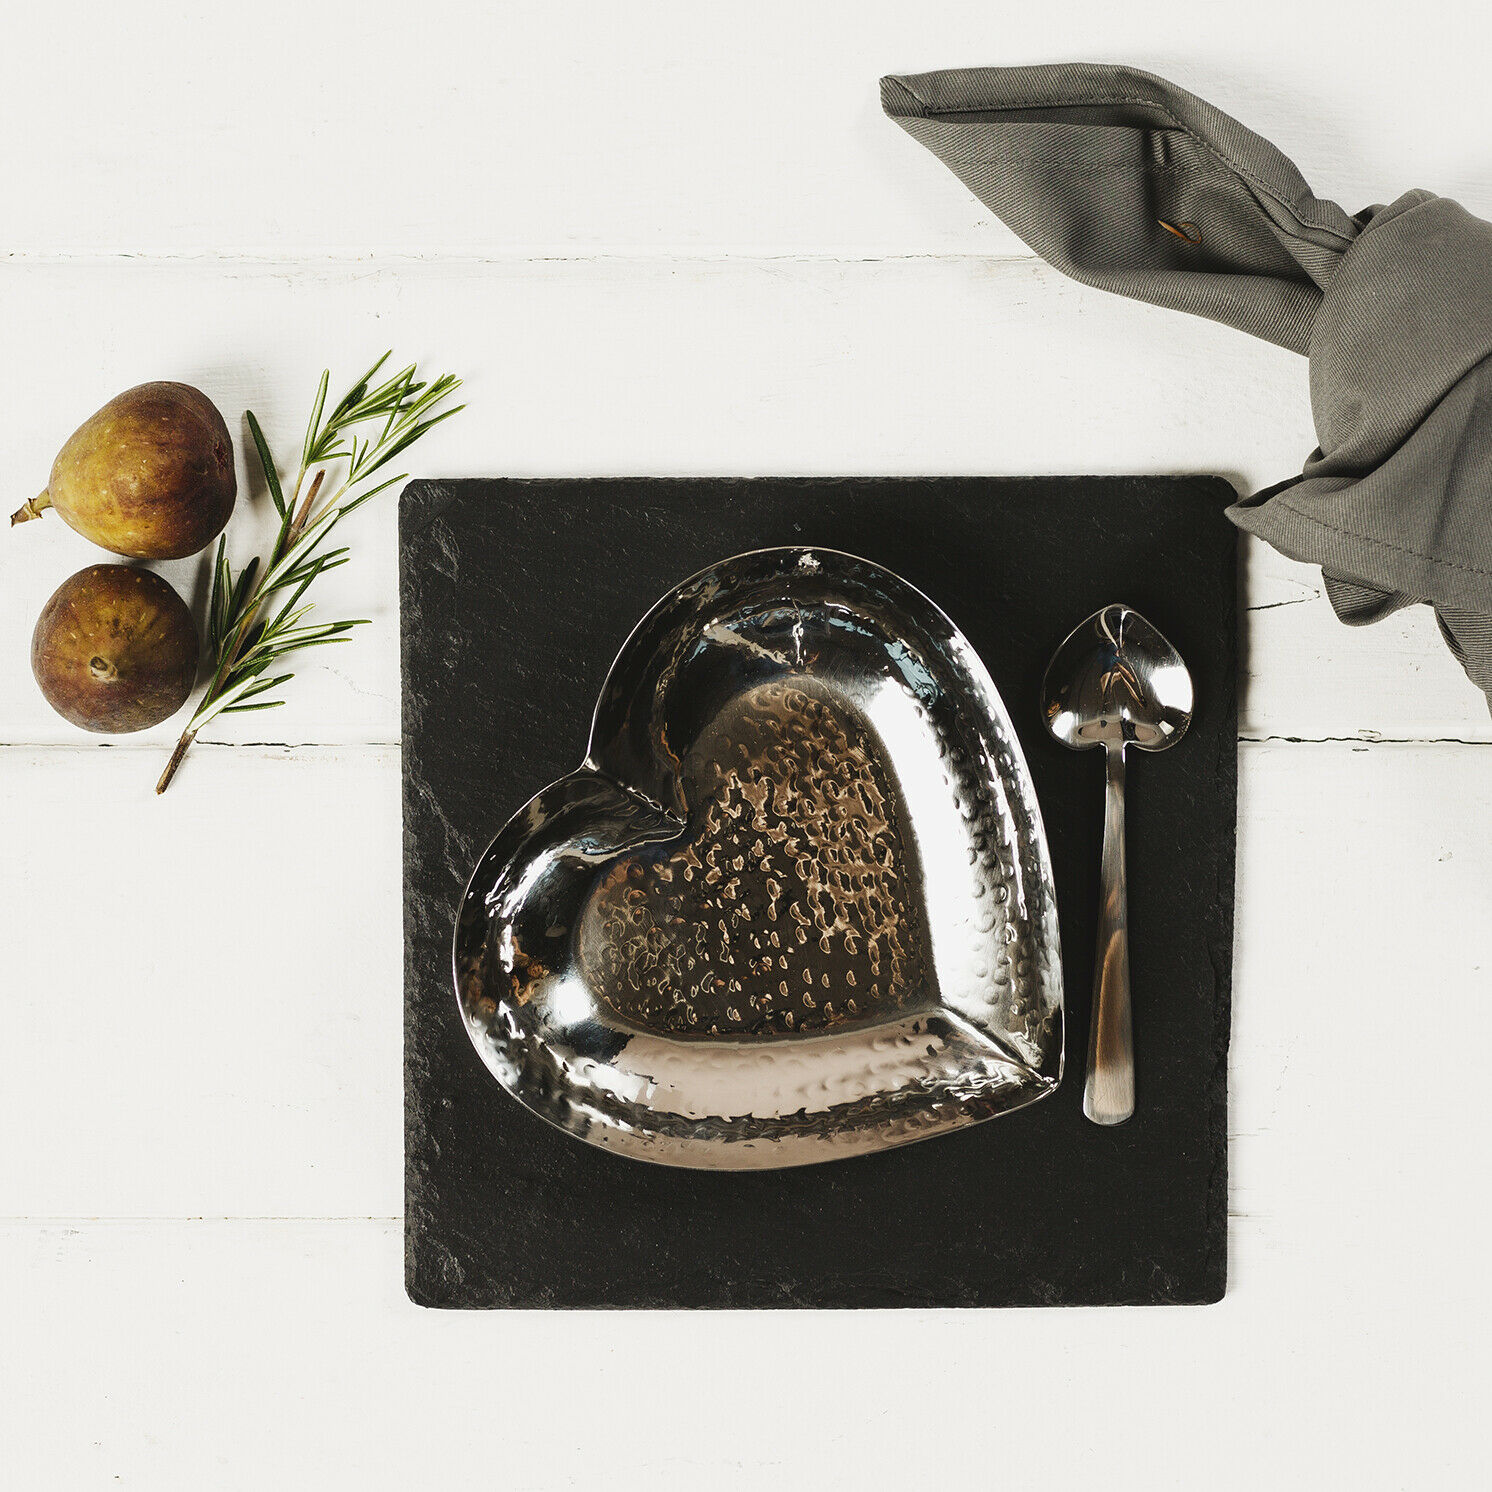 The Just Slate Company – Slate Heart Fusion Dish and Spoon Set in Presentation Box